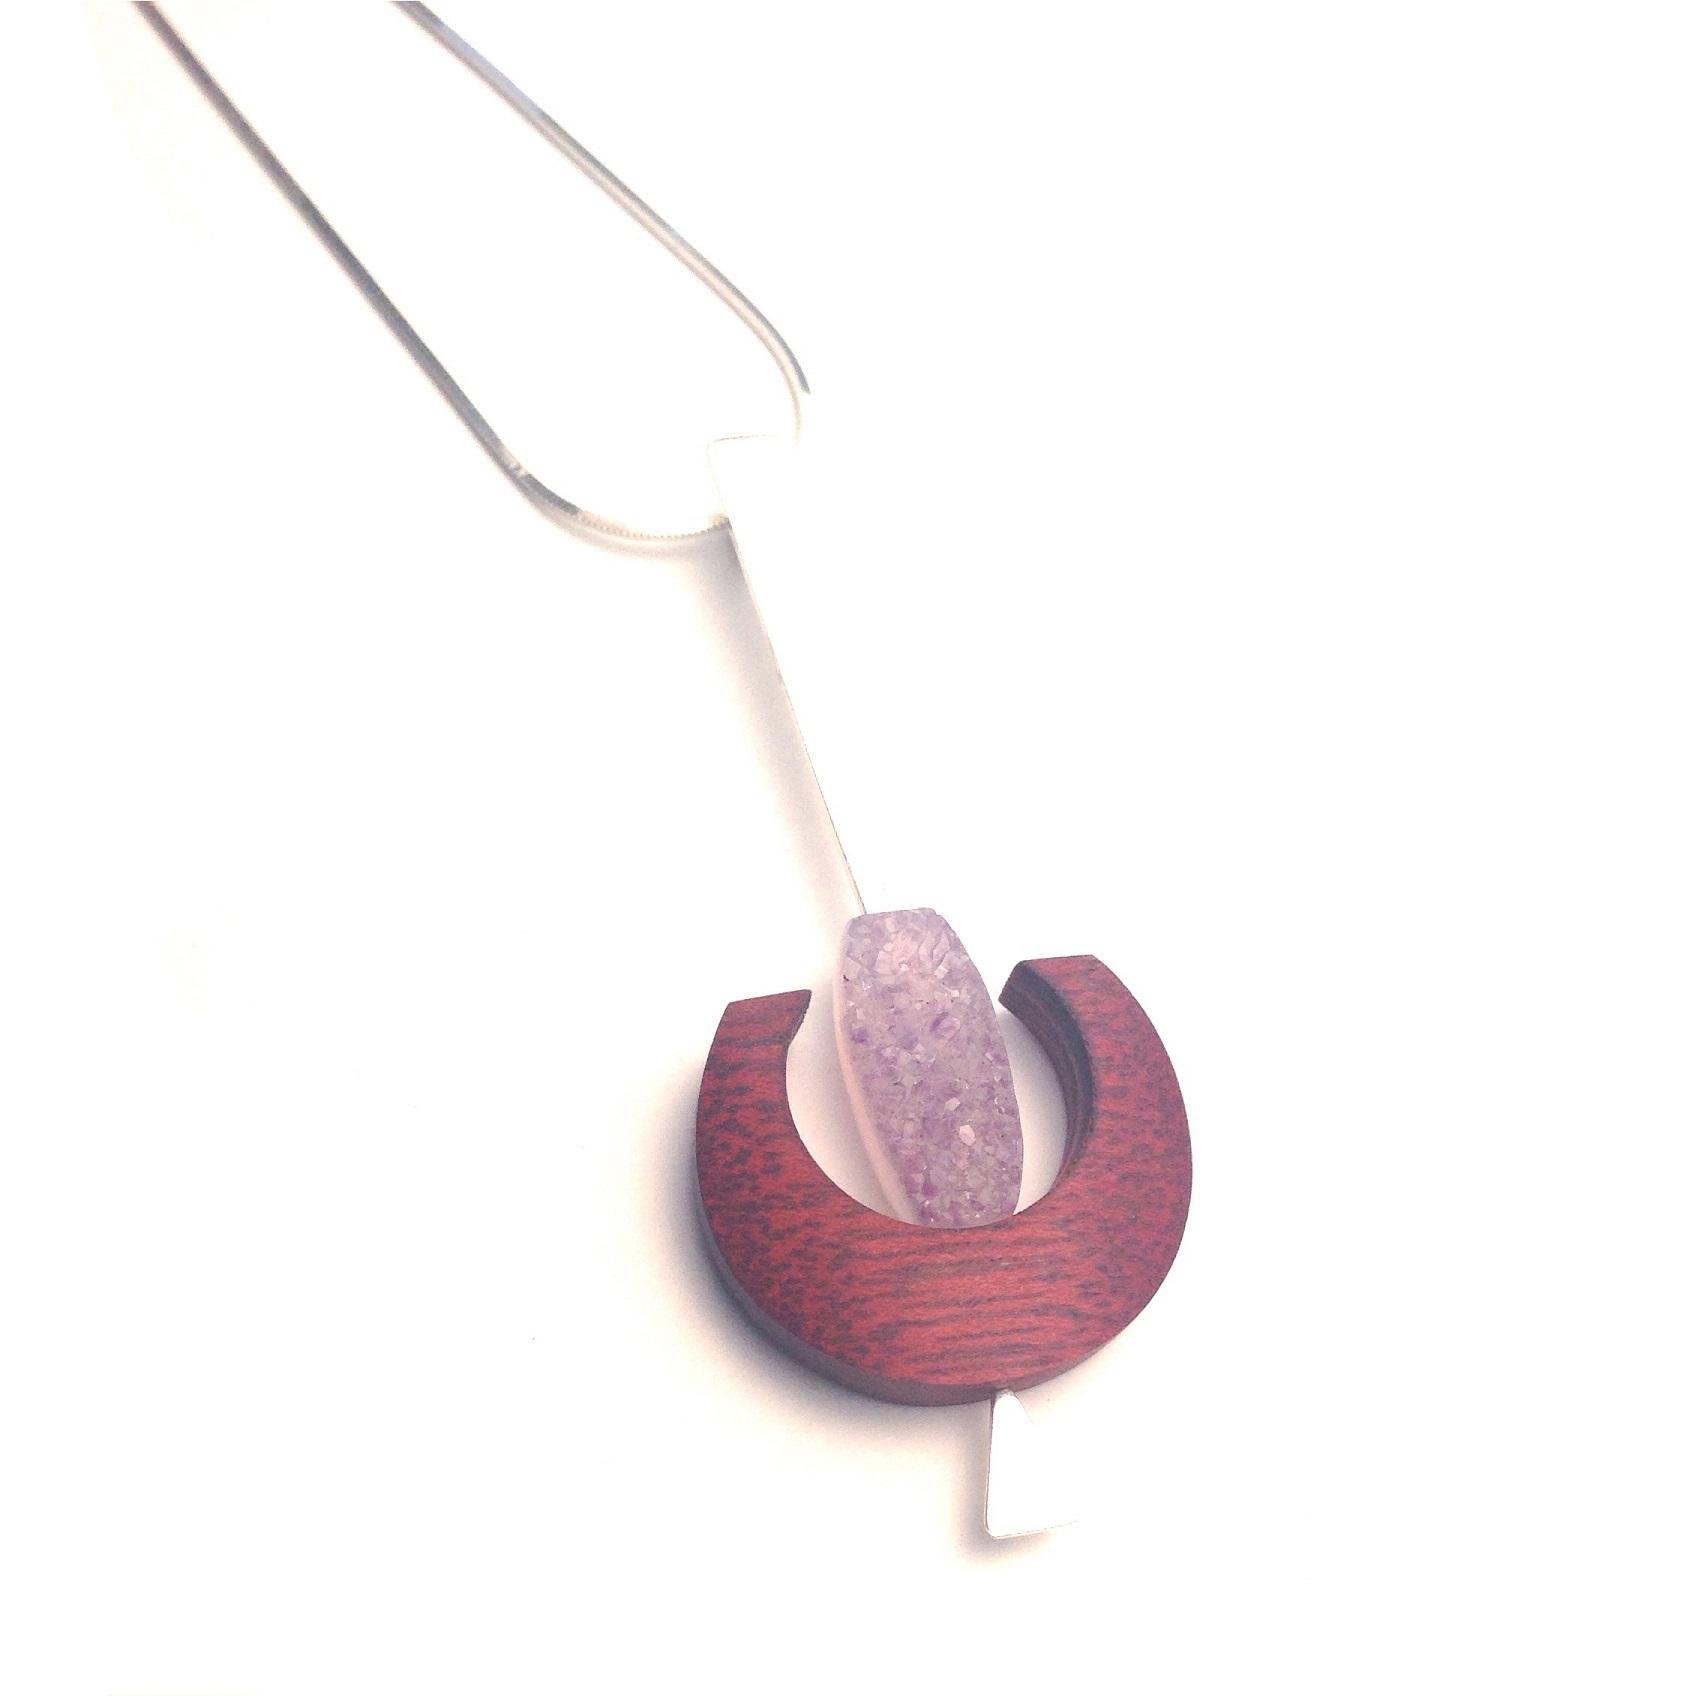 Druse Necklace